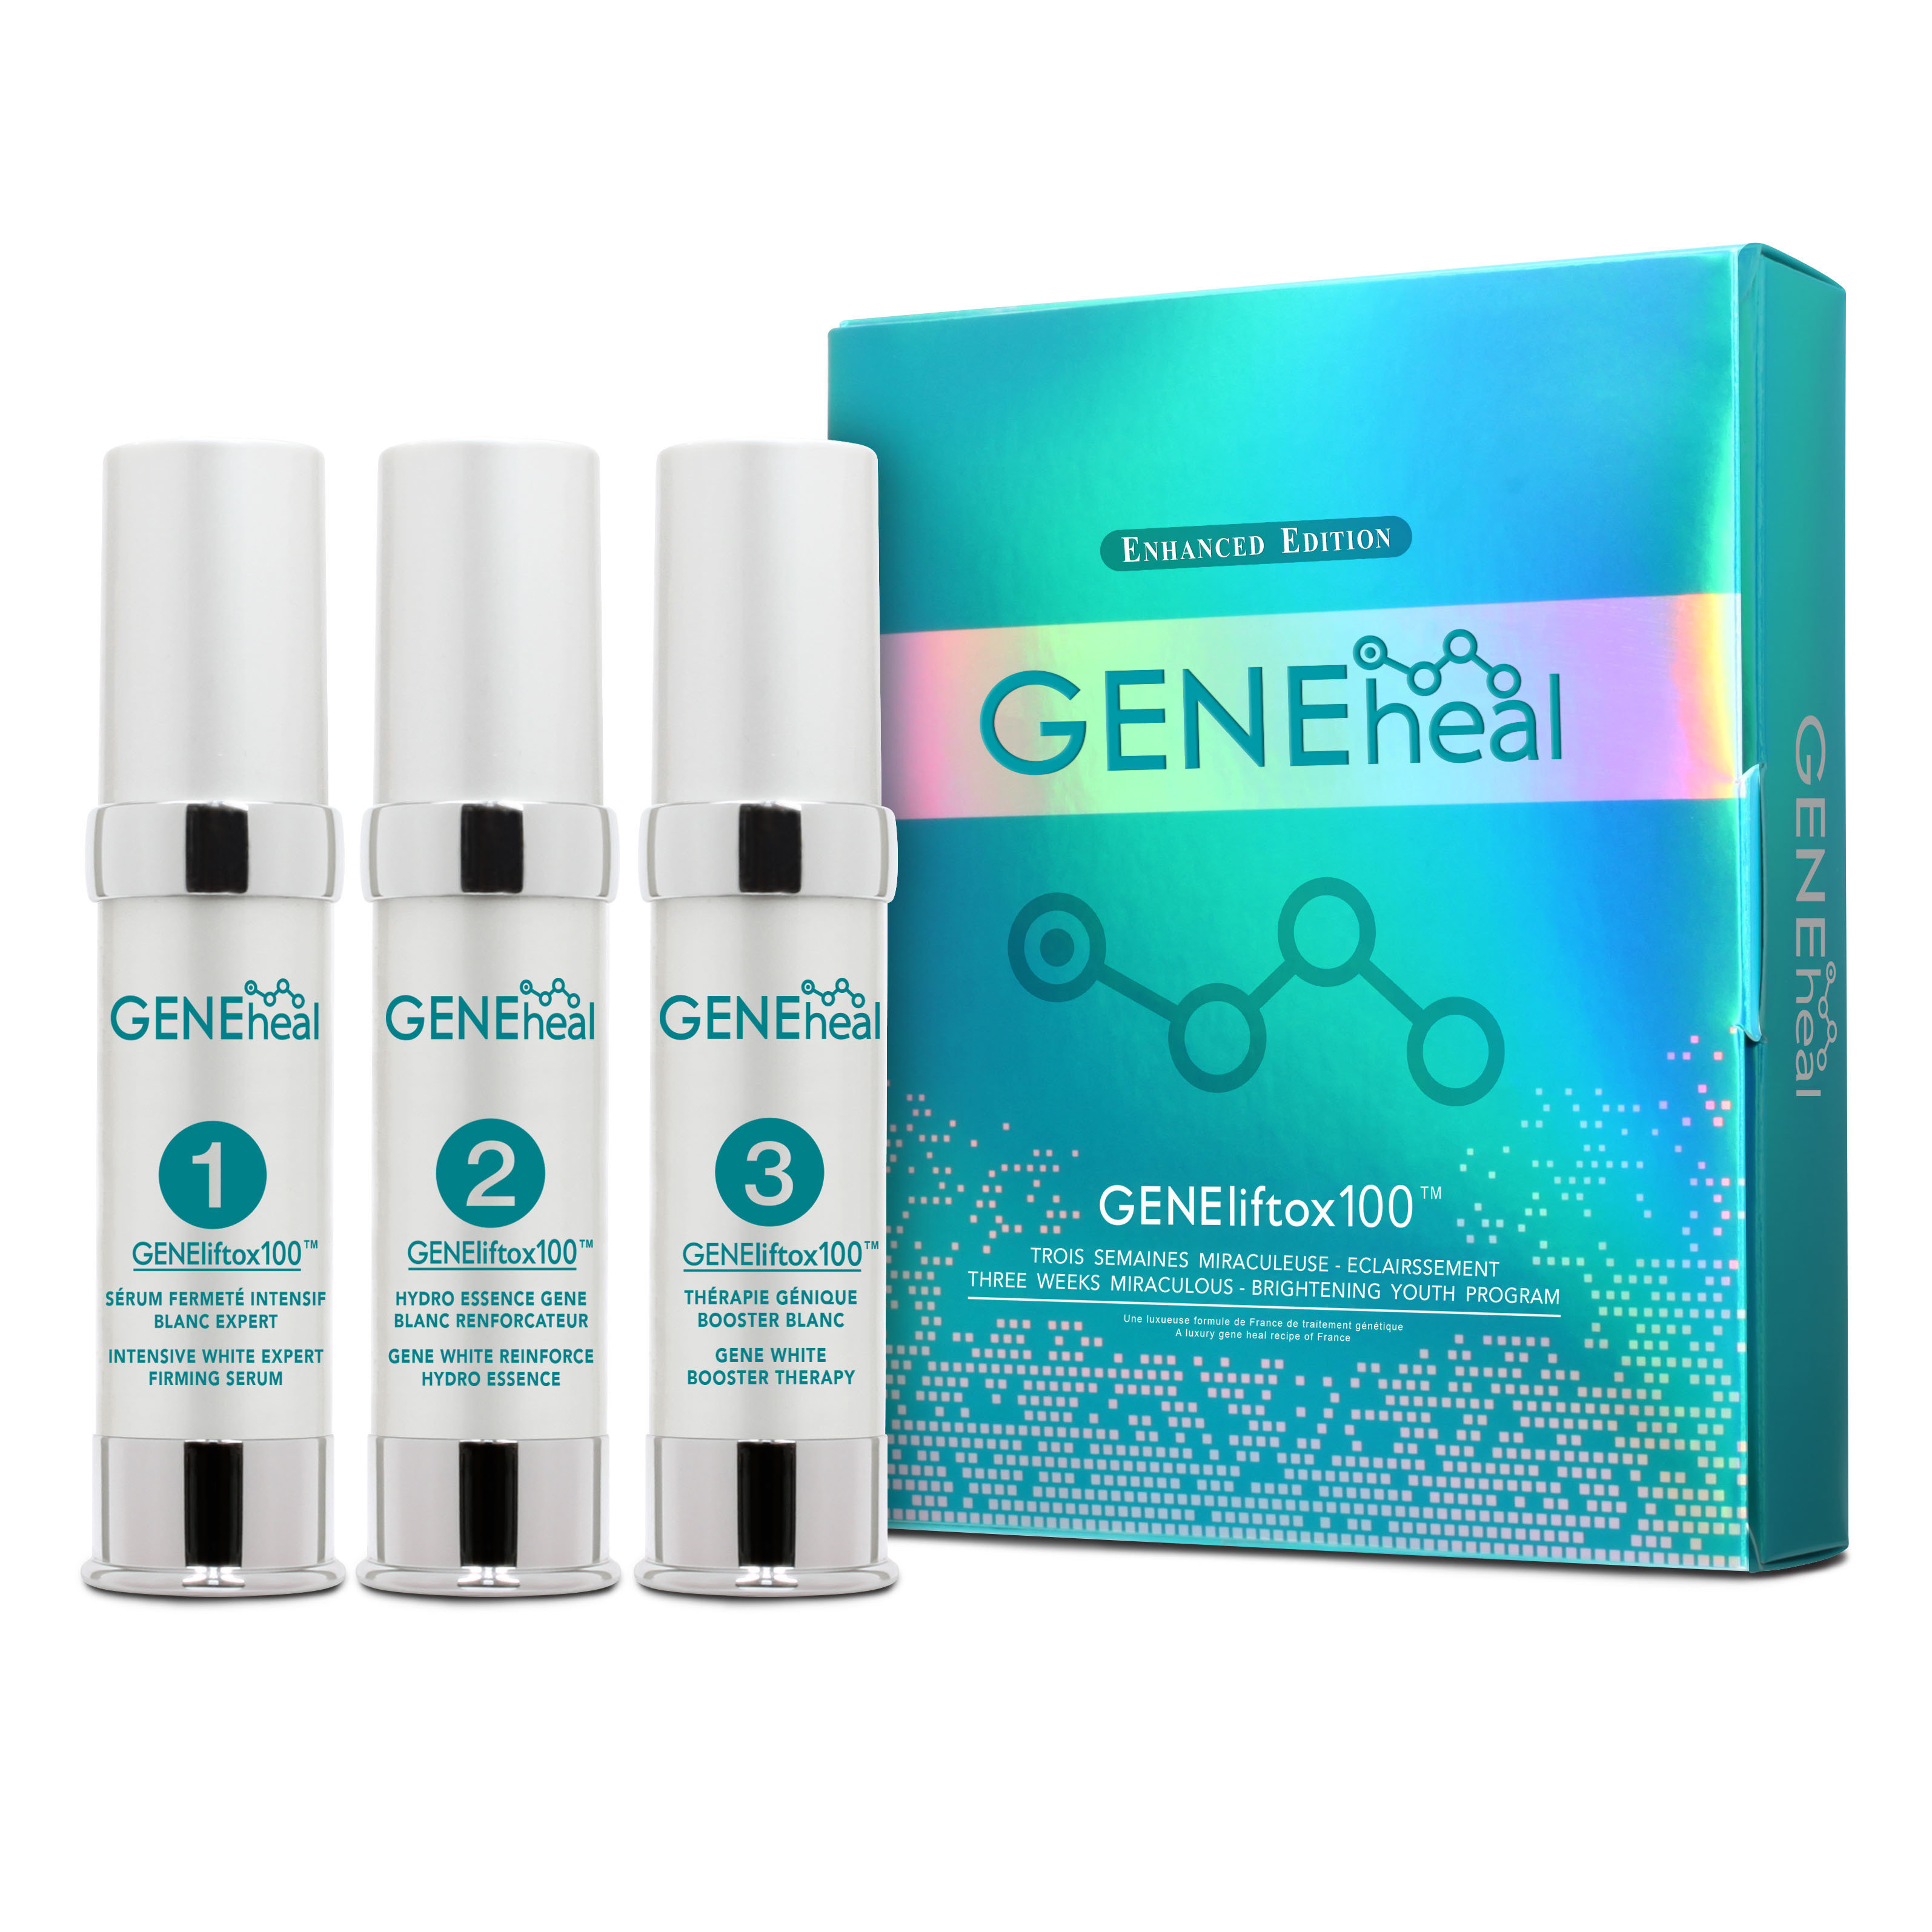 GENEheal 3週奇蹟 - 瞬間亮澤嫩肌方案 GH-D-14-001